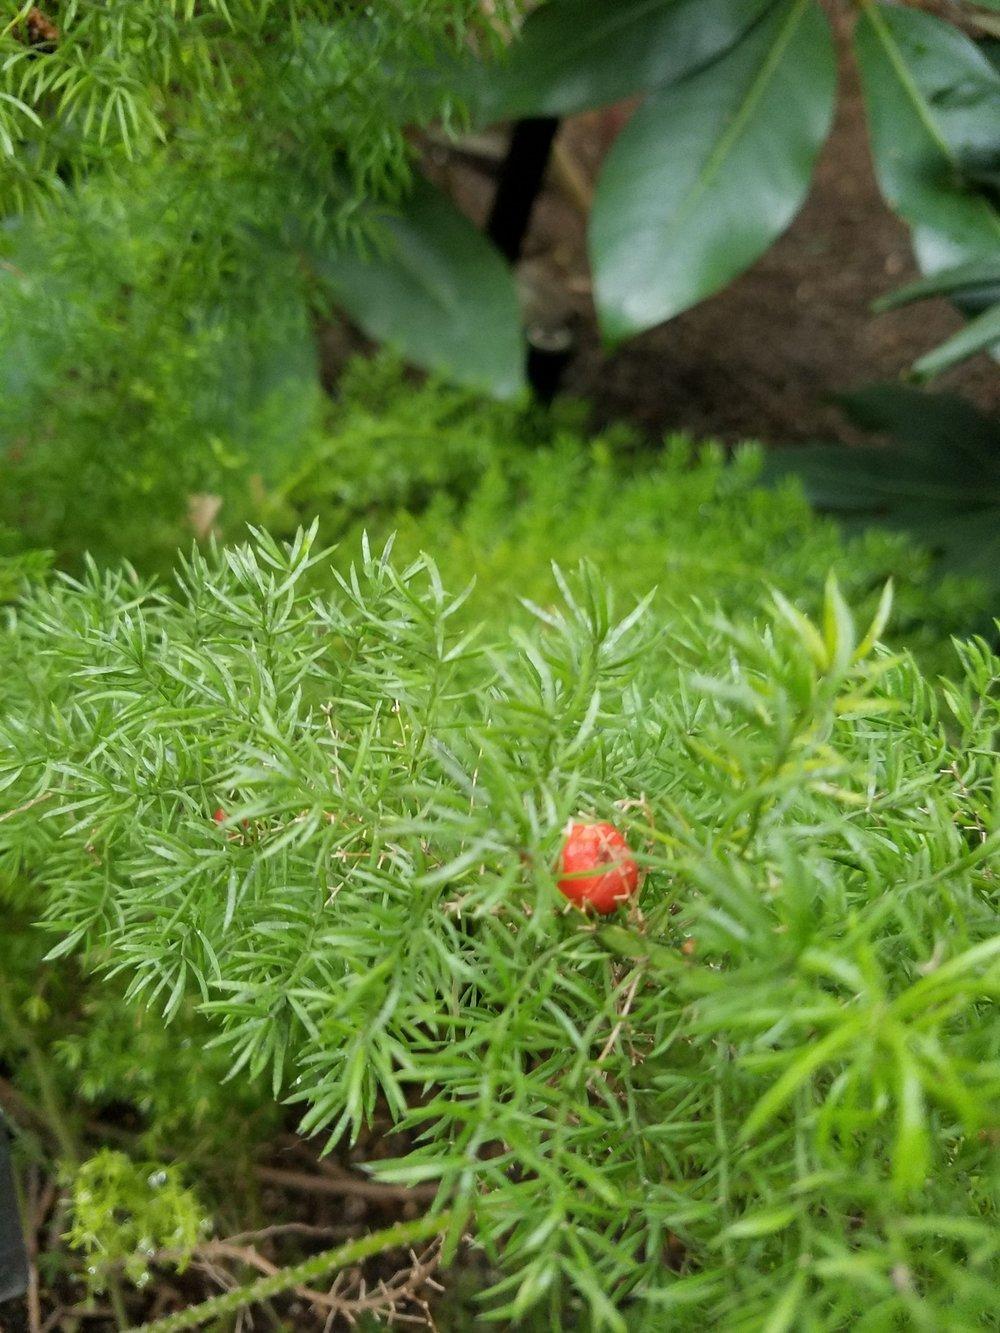 Asparagus fern fruit Photo credit - Shem Ruszczyk